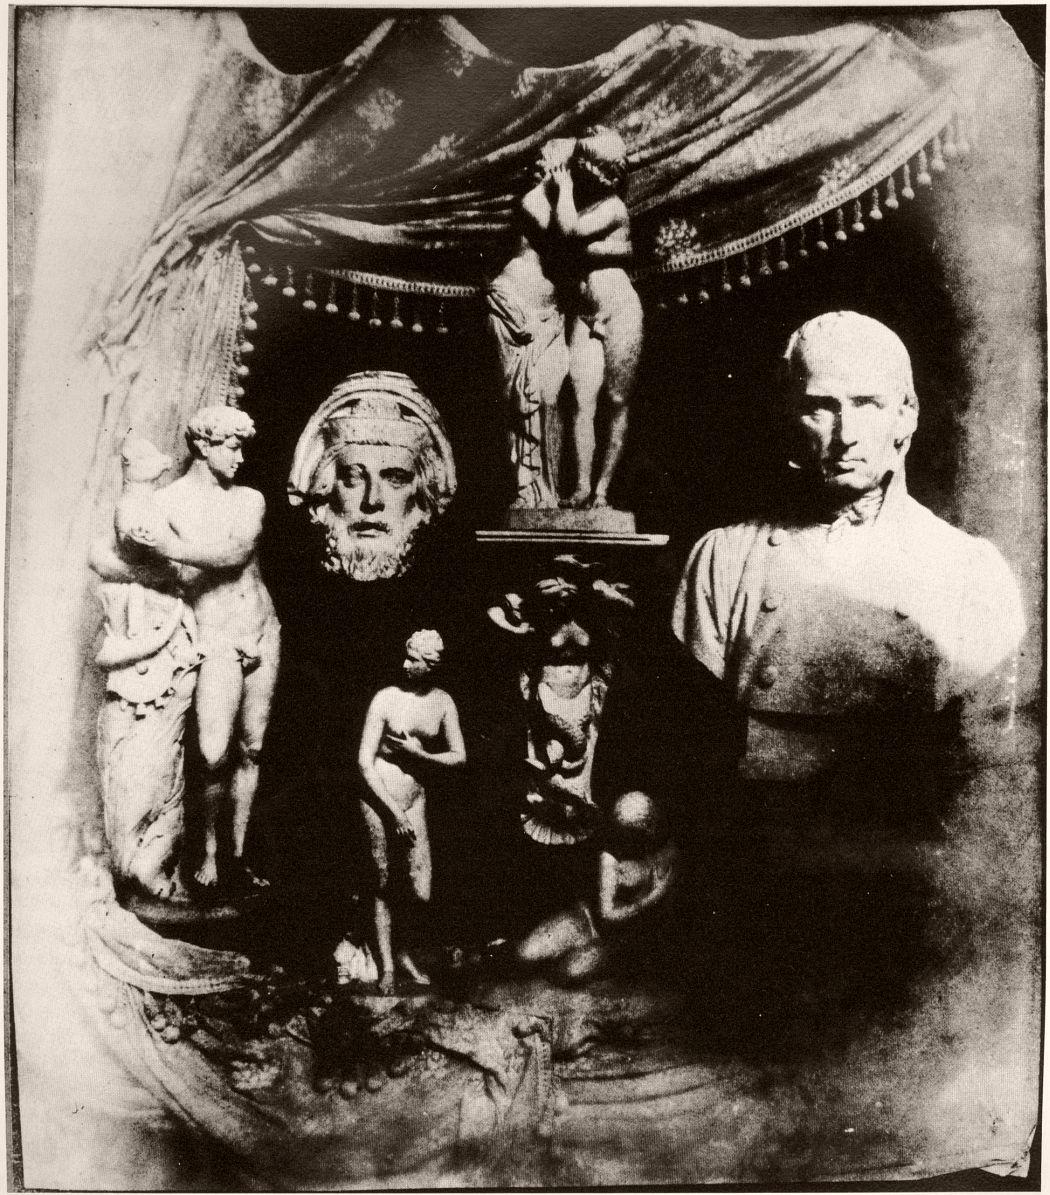 Still life with plaster casts circa 1839